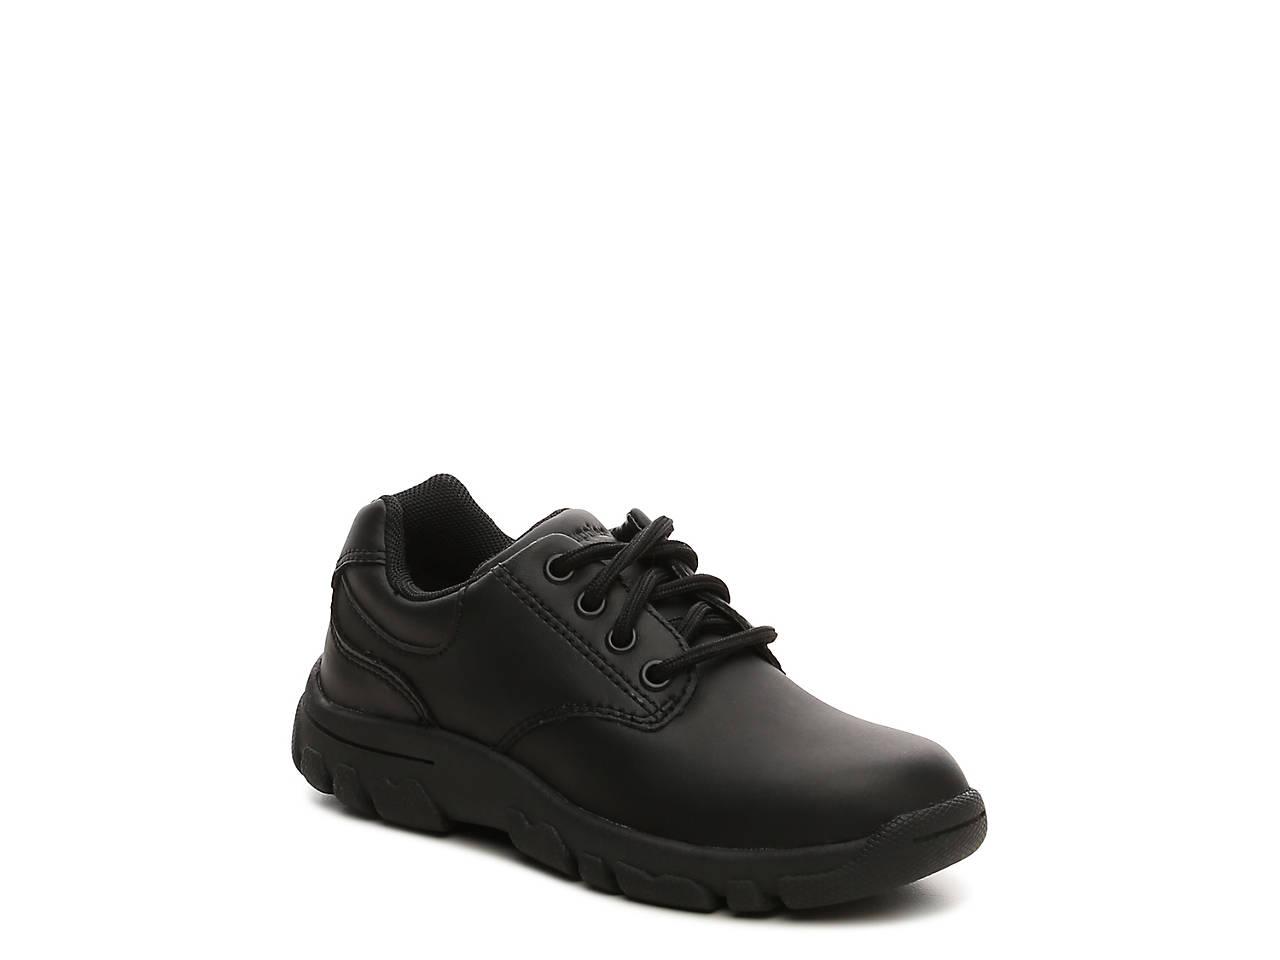 b08ec3b8f1 Hush Puppies Chad Toddler   Youth Sneaker Kids Shoes